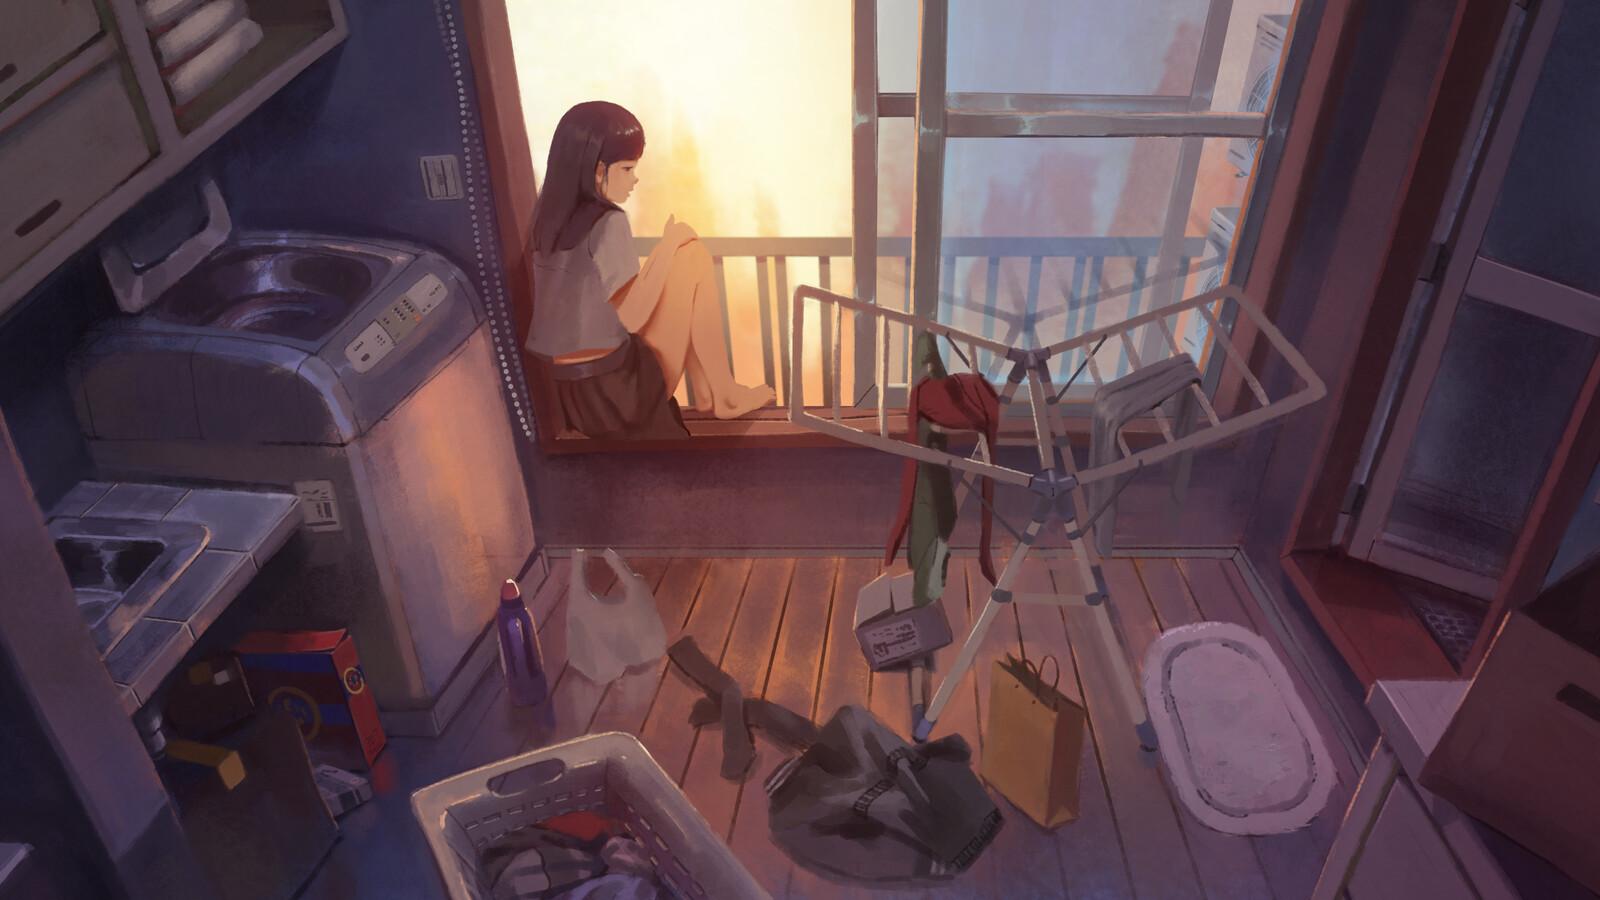 Anime Background Lo-fi